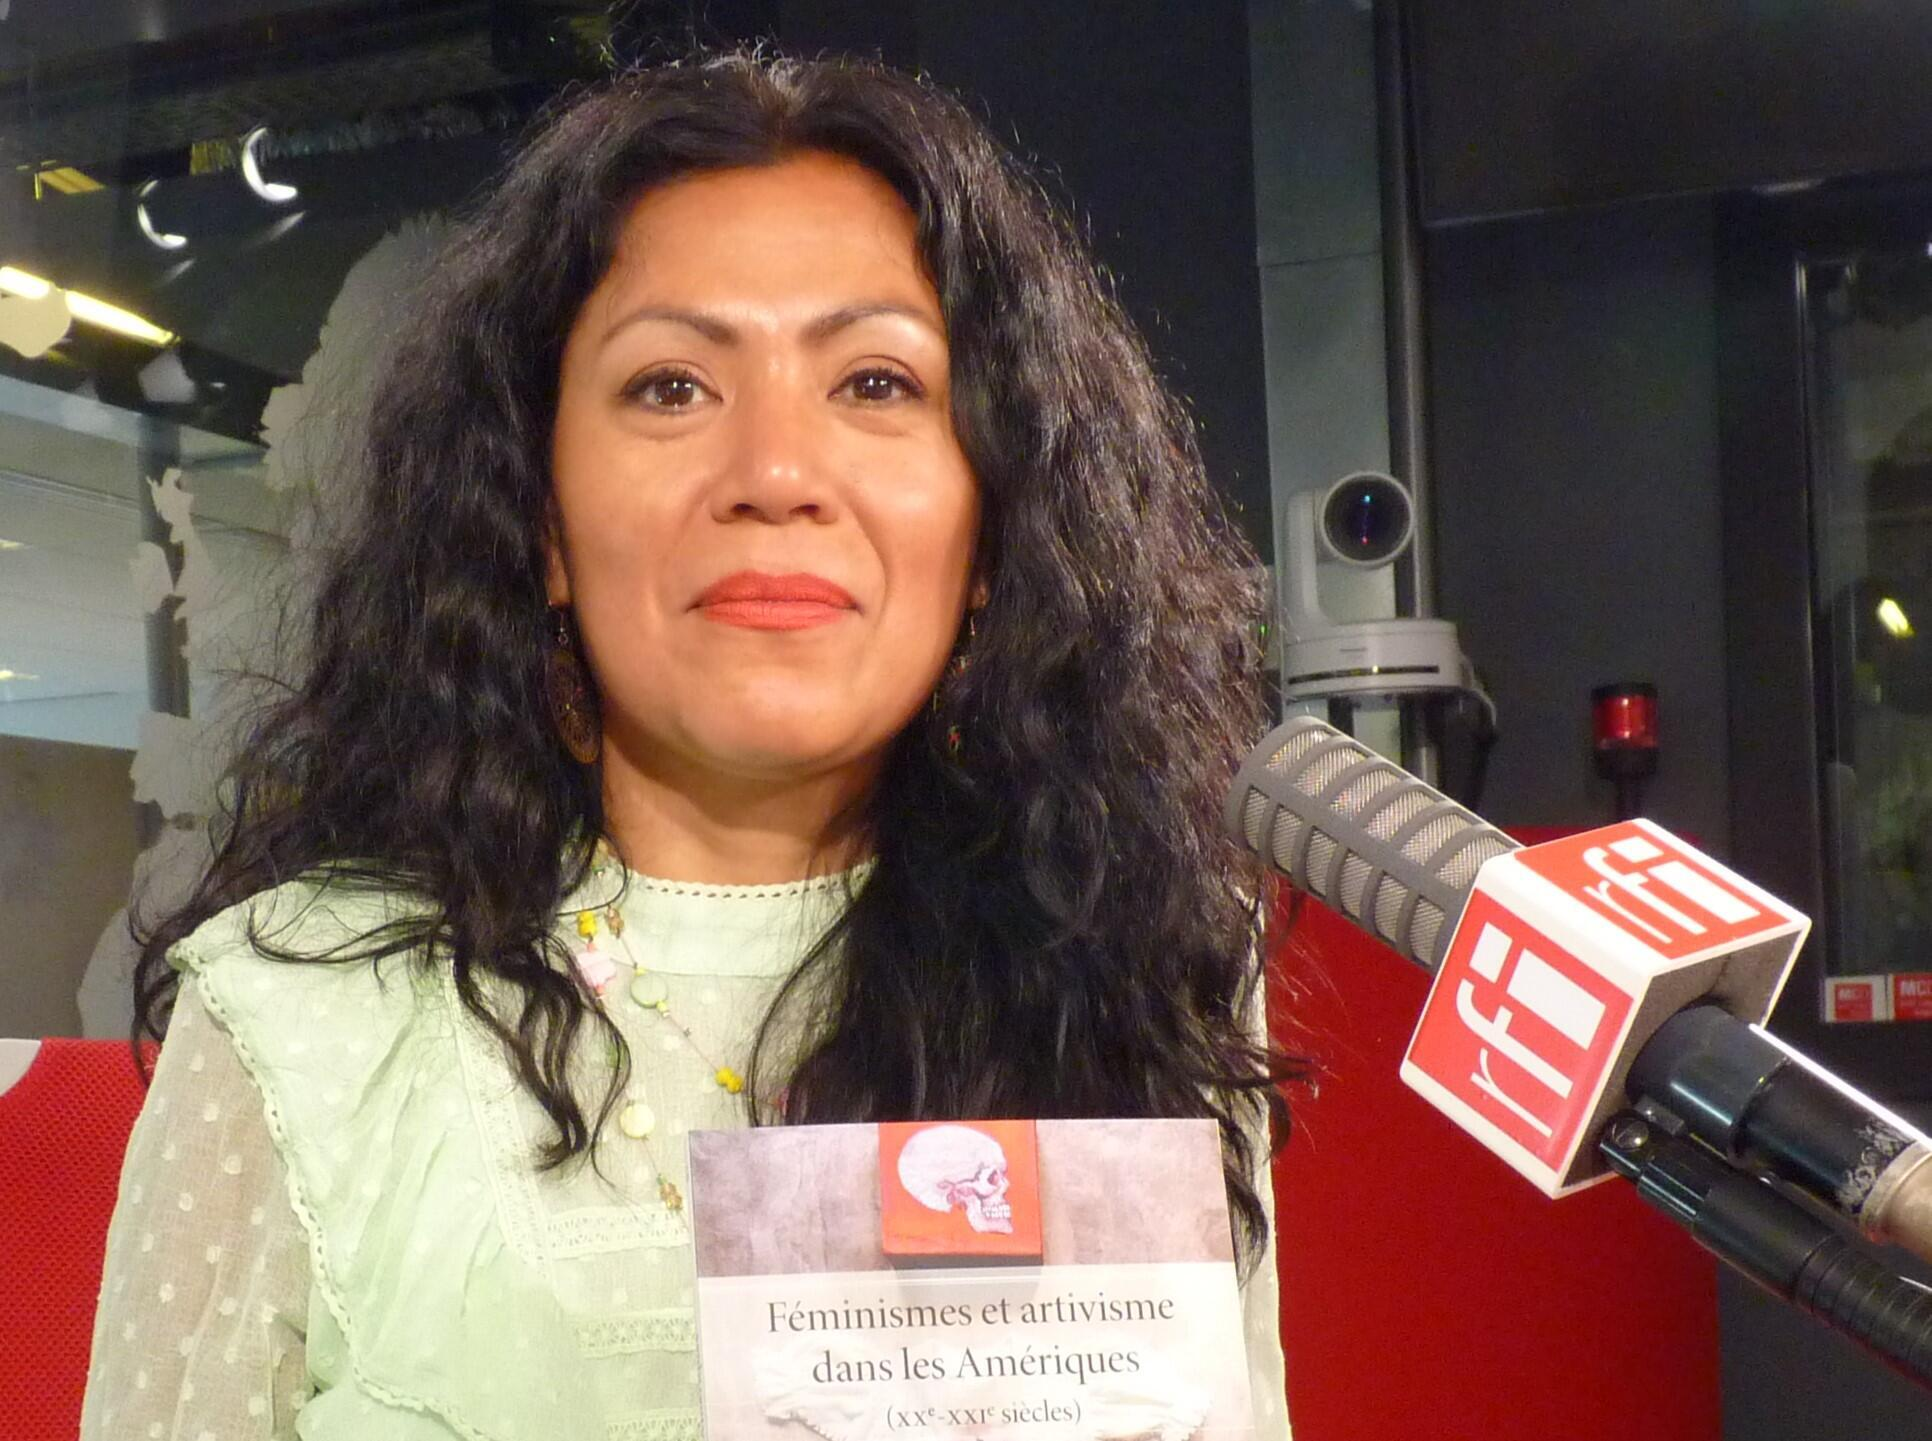 La historiadora peruana Lissell Quiroz